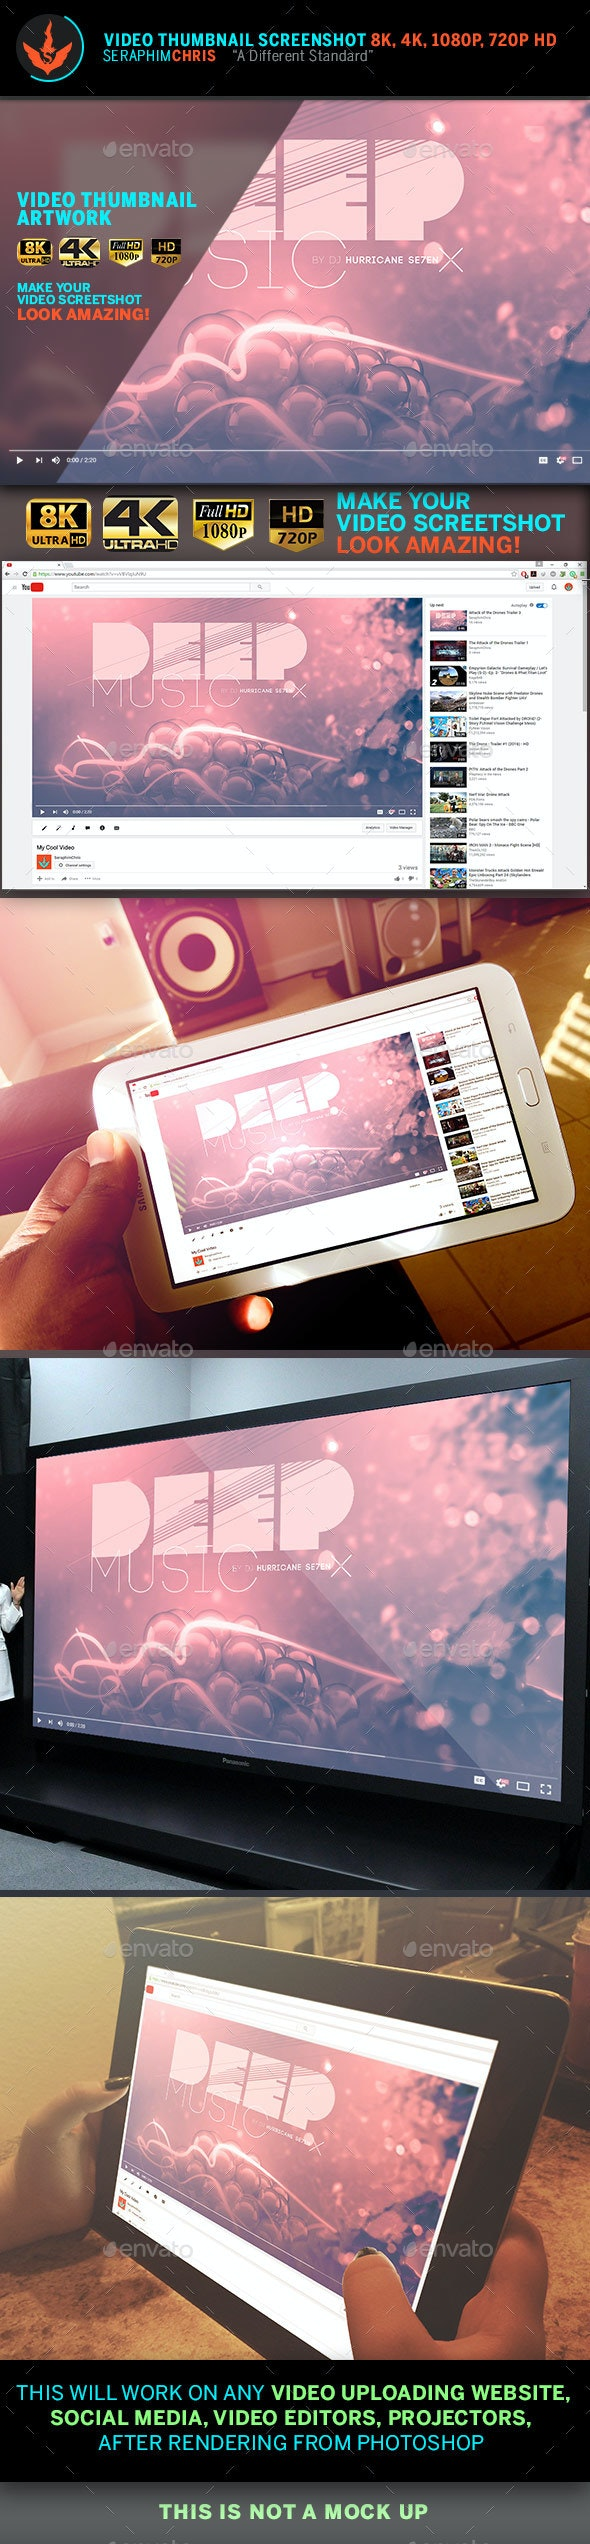 Deep Music YouTube Video Thumbnail Screenshot Template - YouTube Social Media